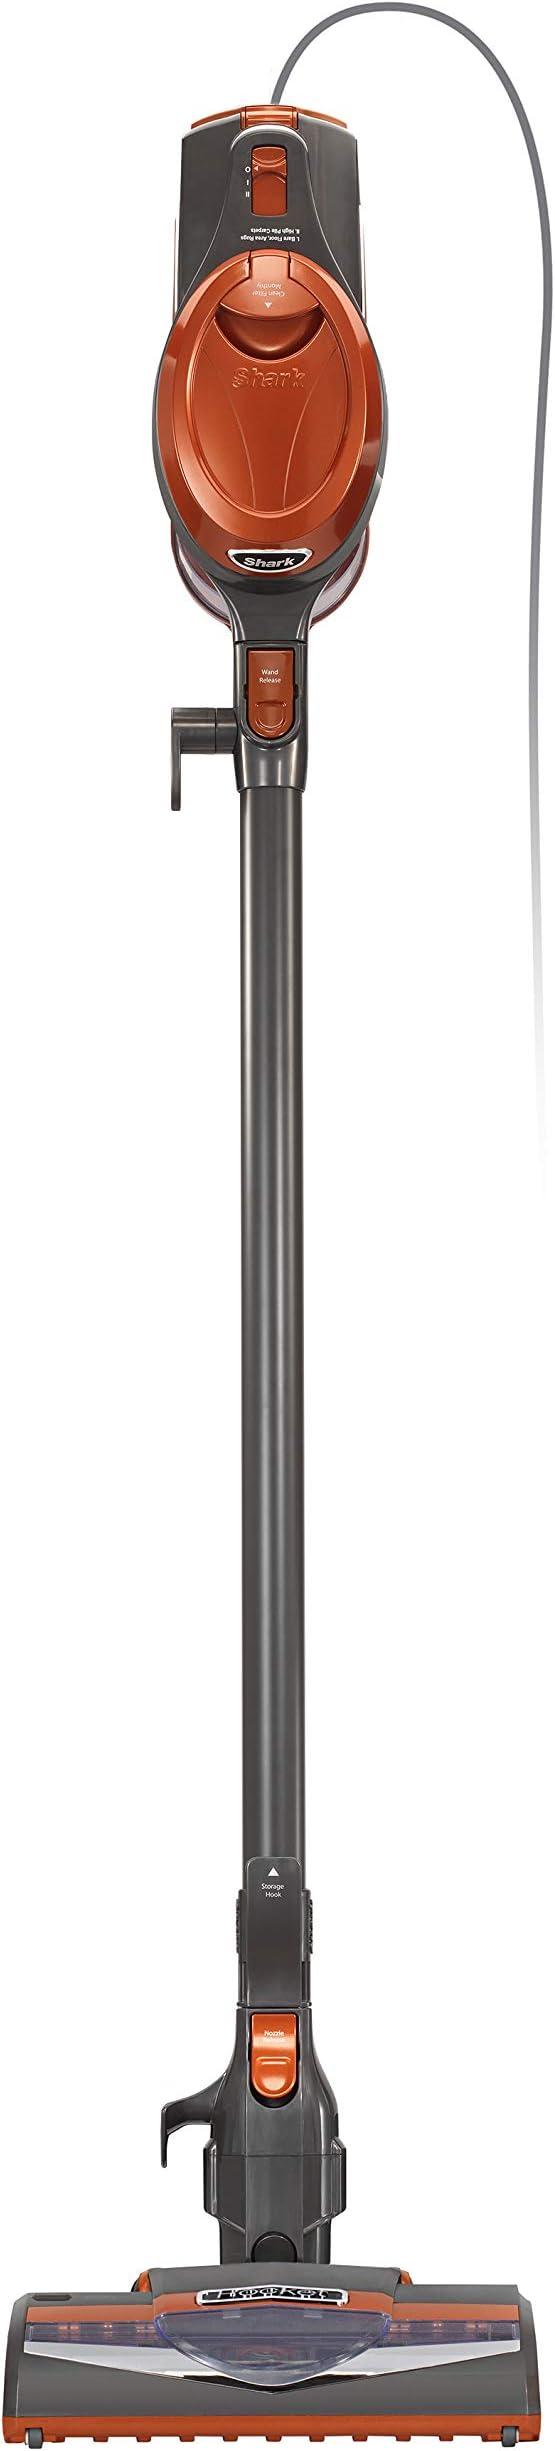 Shark Rocket HV302 Corded Bagless Stick Vacuum